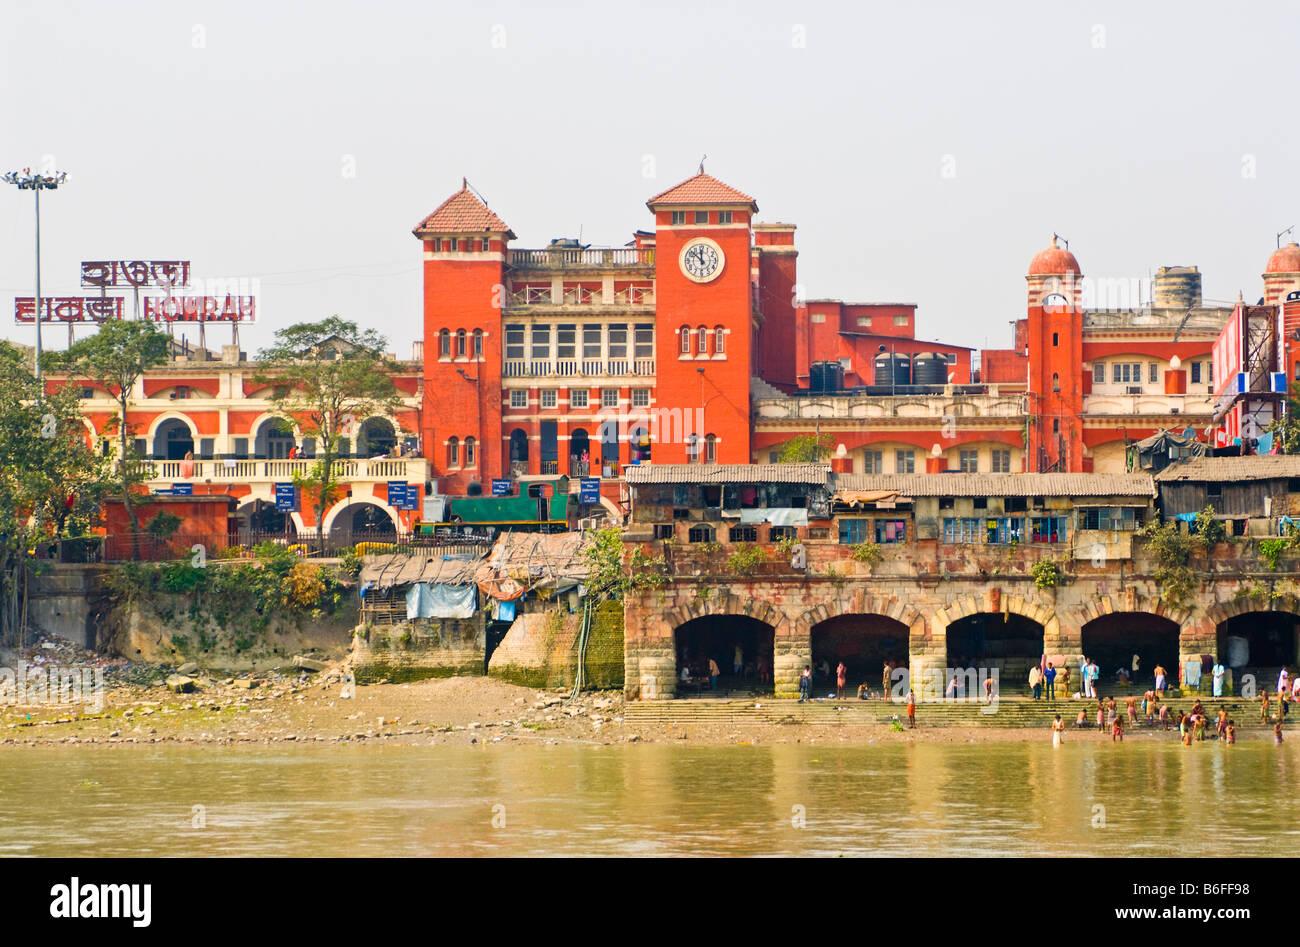 Howrah Station, Kolkata, India Stock Photo: 21239604 - Alamy